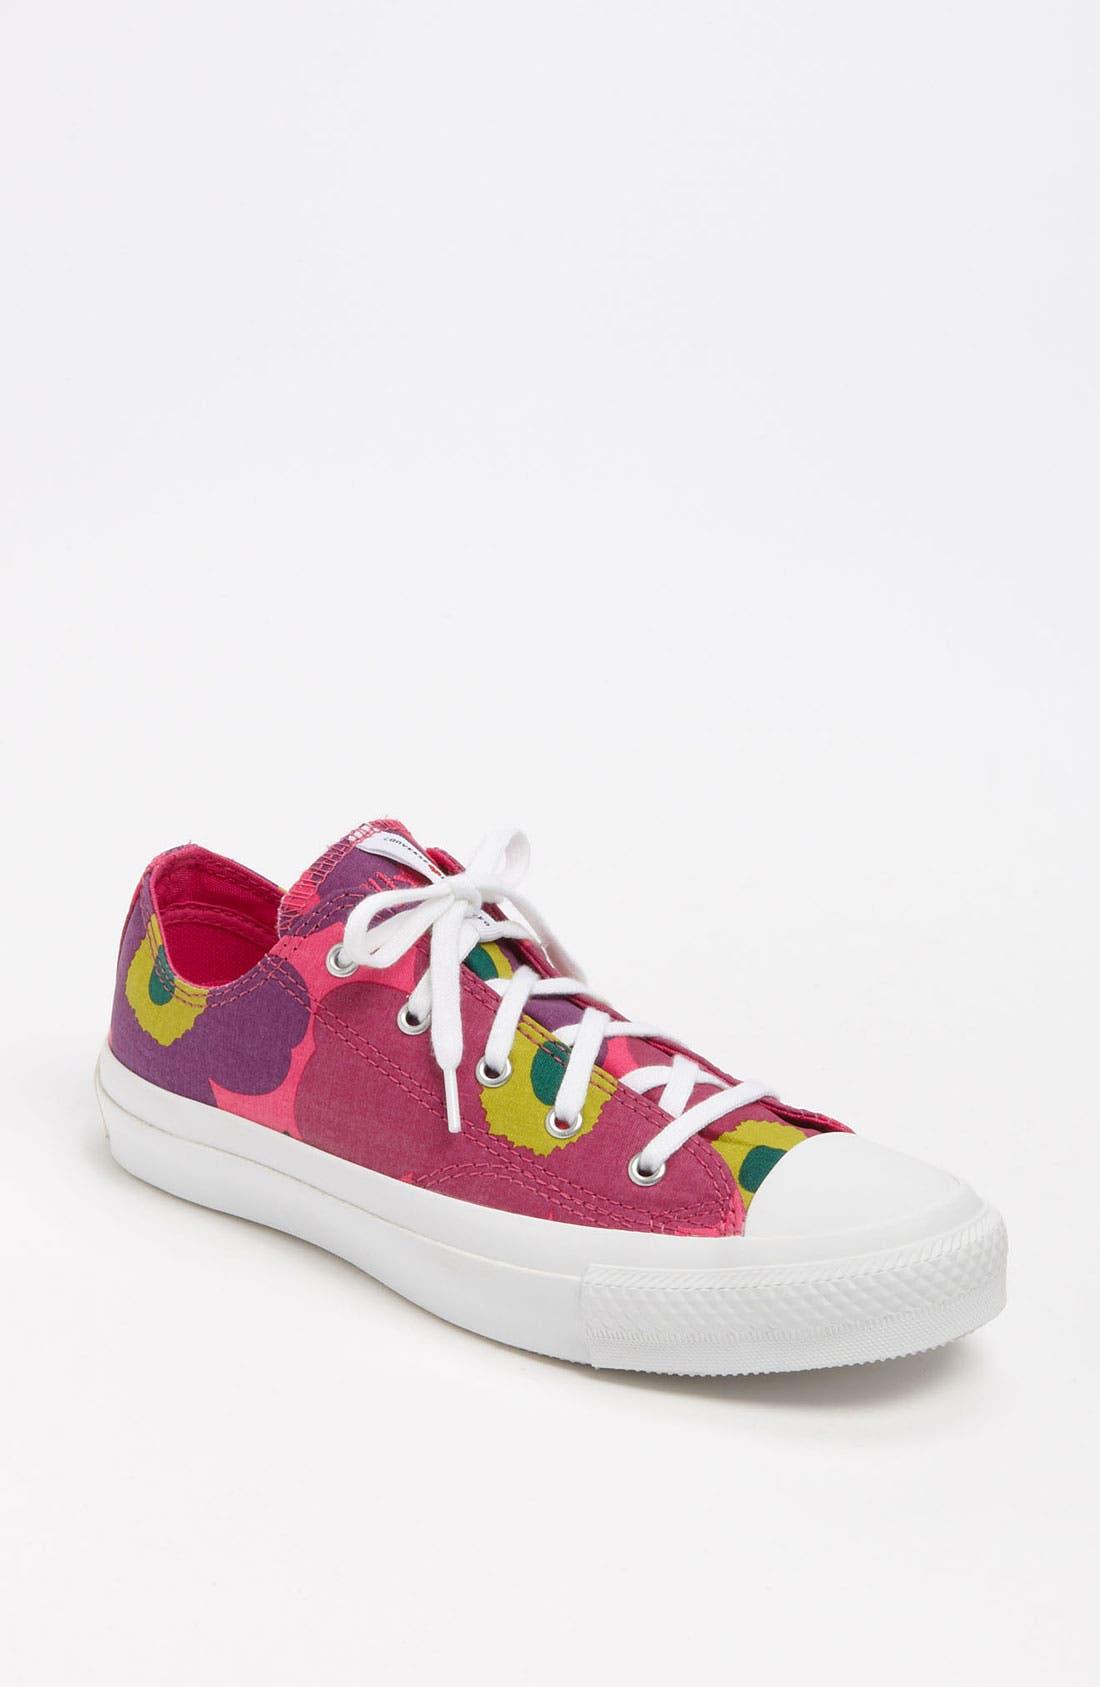 Alternate Image 1 Selected - Converse Loves Merimekko Chuck Taylor® Low Sneaker (Women)